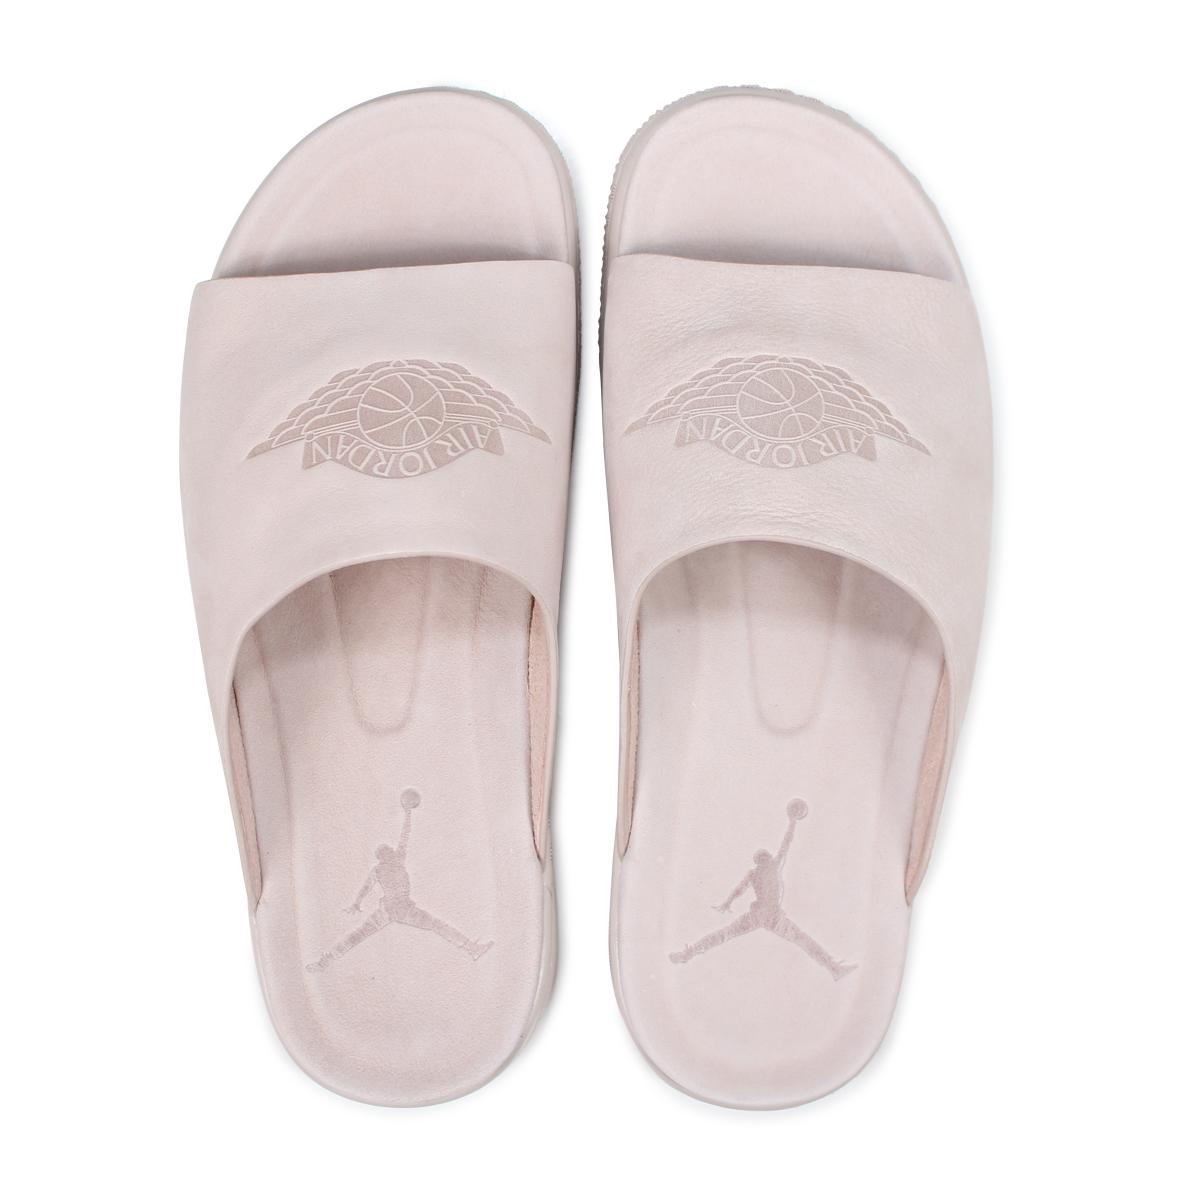 6eb2ad67c770 ... cheapest nike wmns jordan modero 1 nike sandals jordan shower sandals  sports ladys men ao9919 200